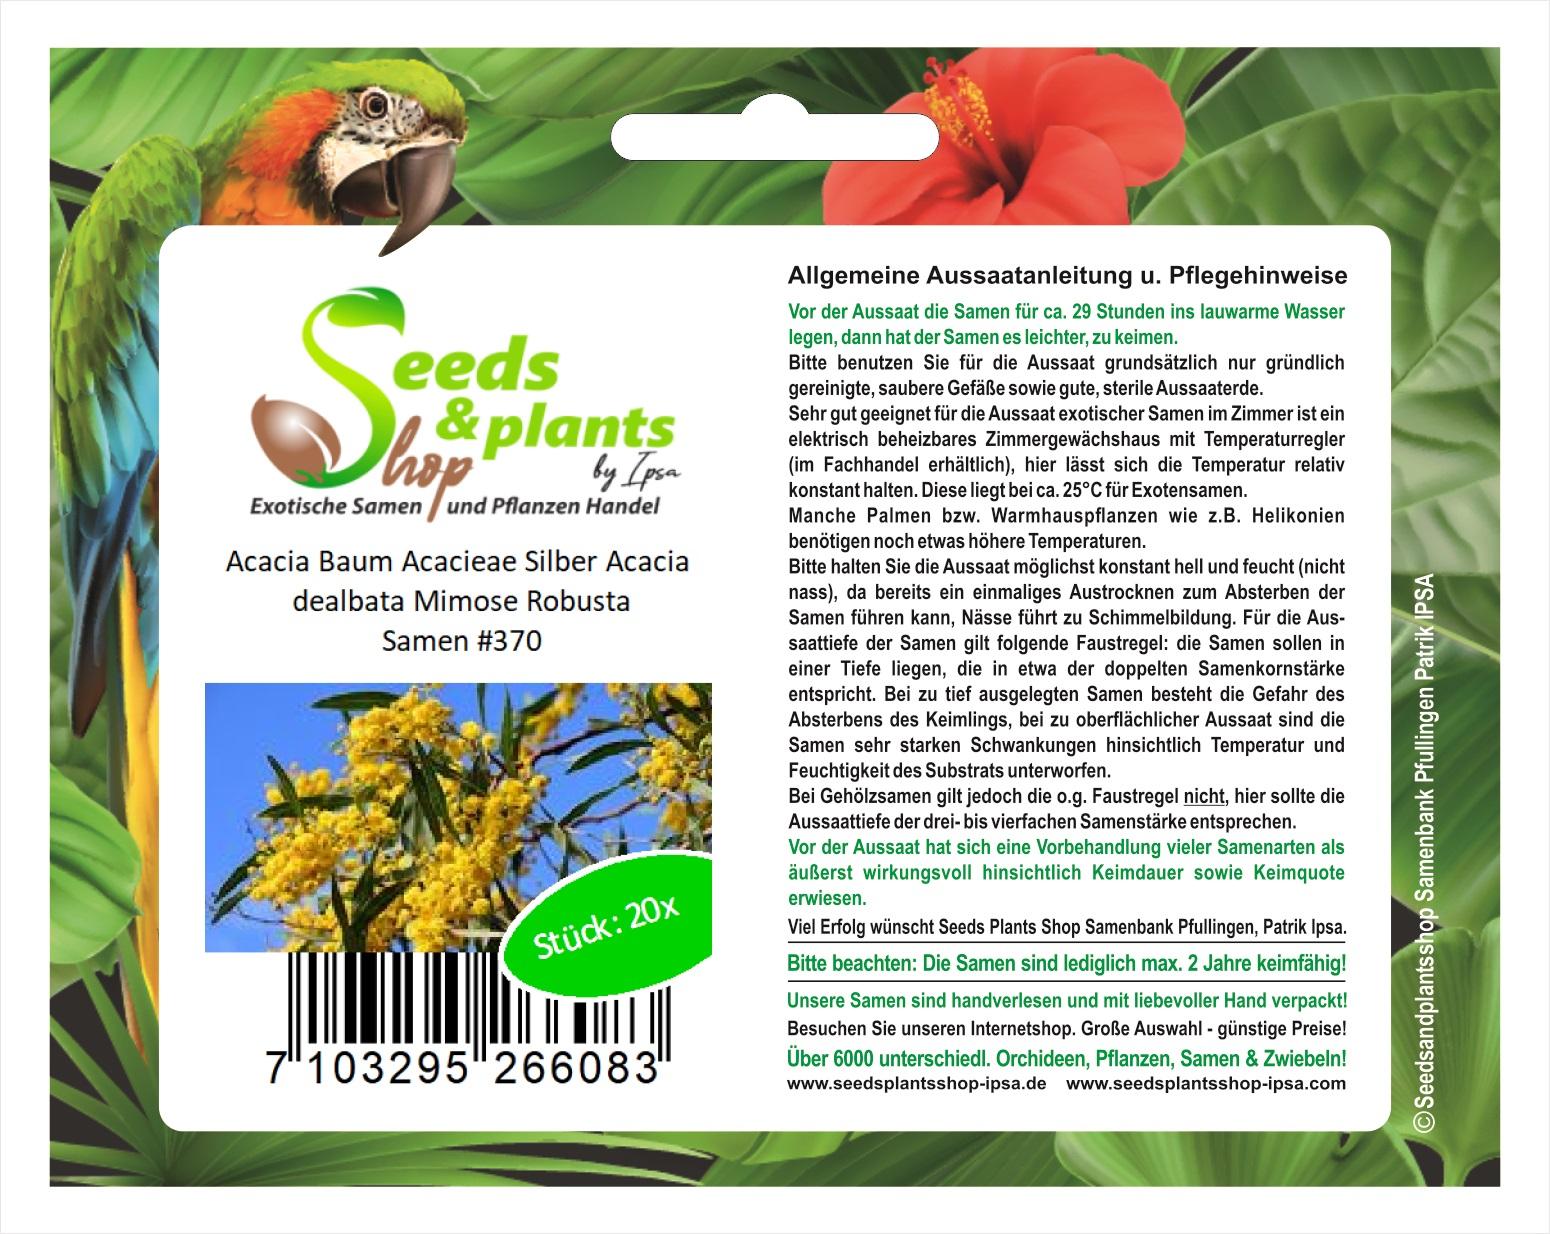 Seeds Plants Shop Samenbank Pfullingen Patrik Ipsa Stk 20x Acacia Acacieae Silber dealbata Mimose Robusta Samen #370